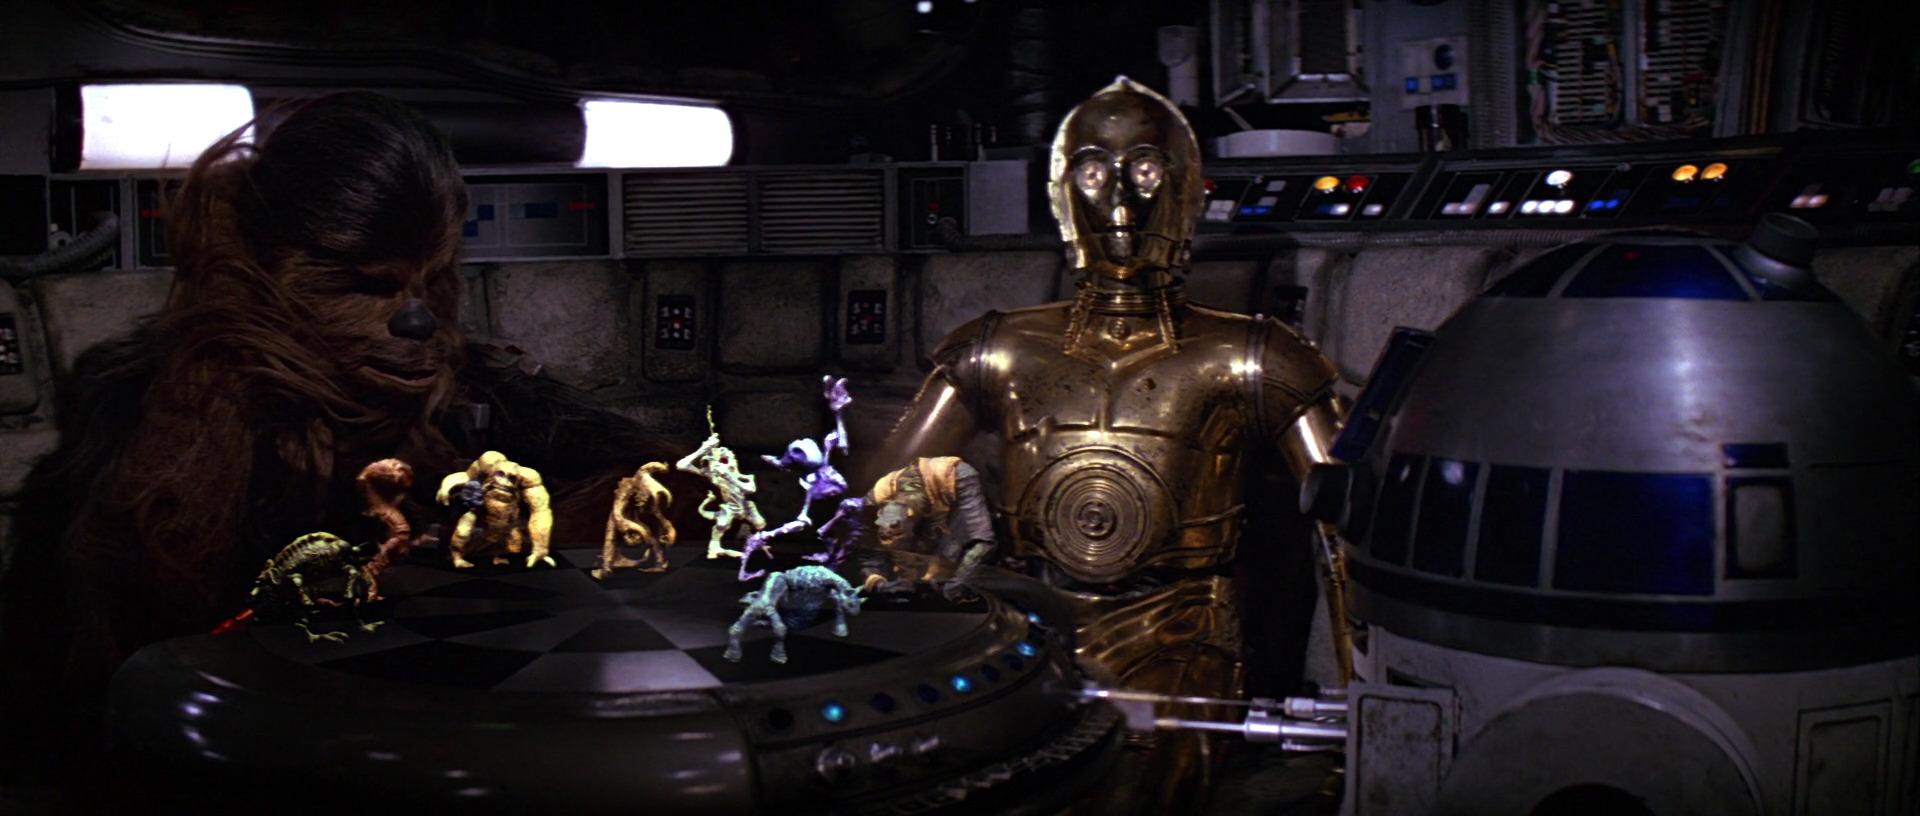 star-wars4-movie-screencaps.com-6938